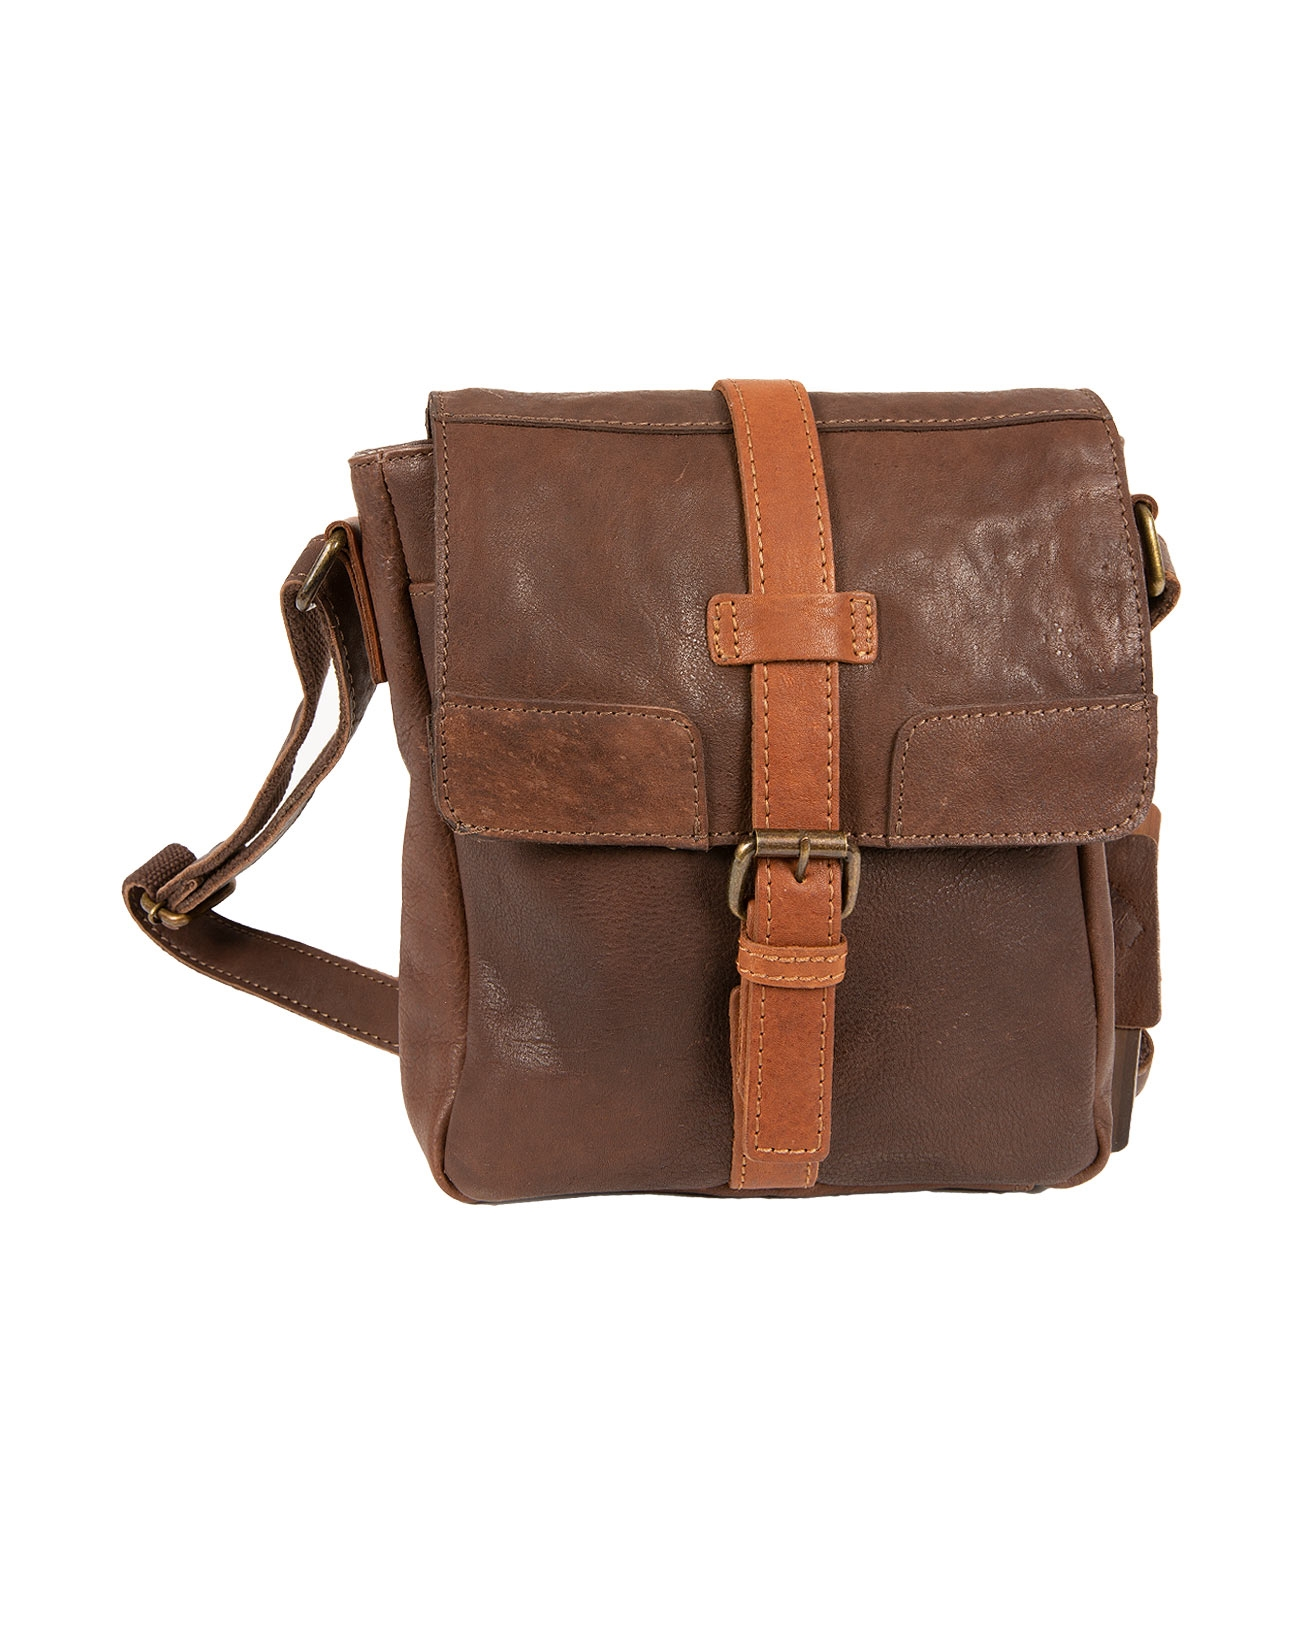 Leather Cross Body Bag - 416